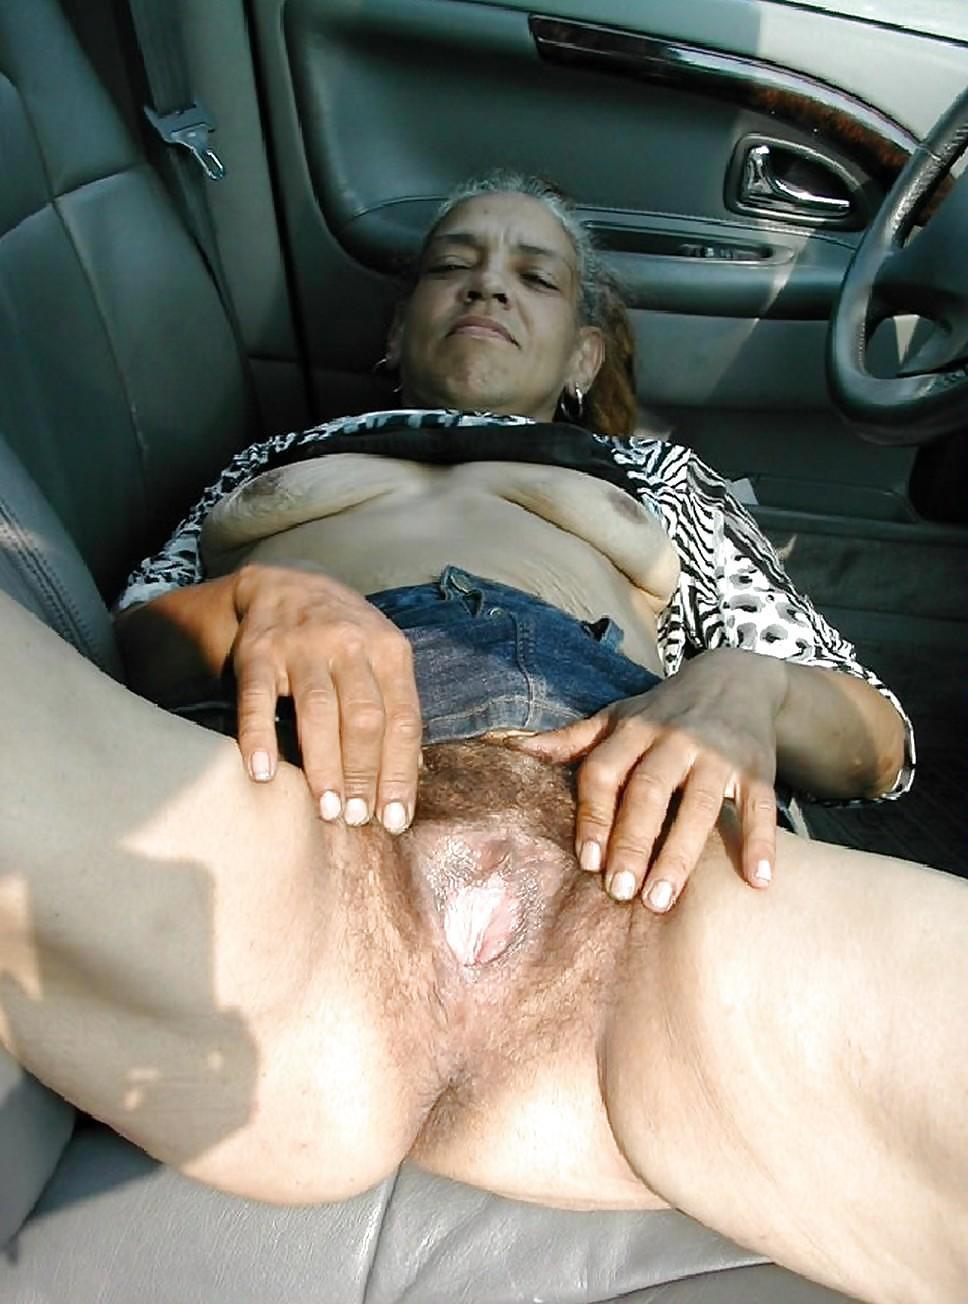 Oral sex orgasm on women